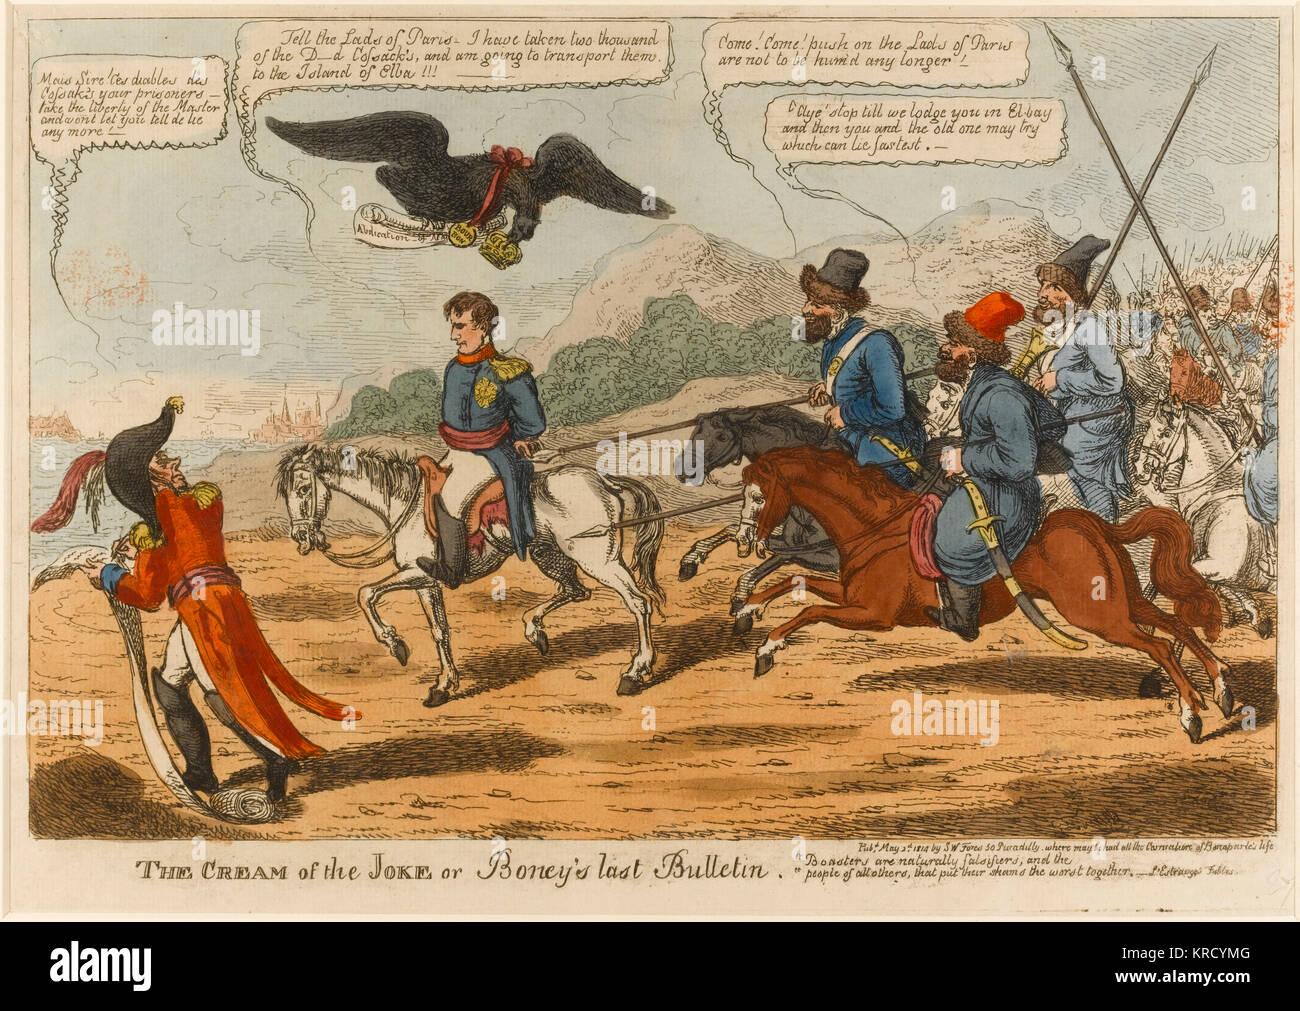 Satirical cartoon, The Cream of the Joke or Boney's last Bulletin.  Napoleon, a prisoner, rides on his famous - Stock Image